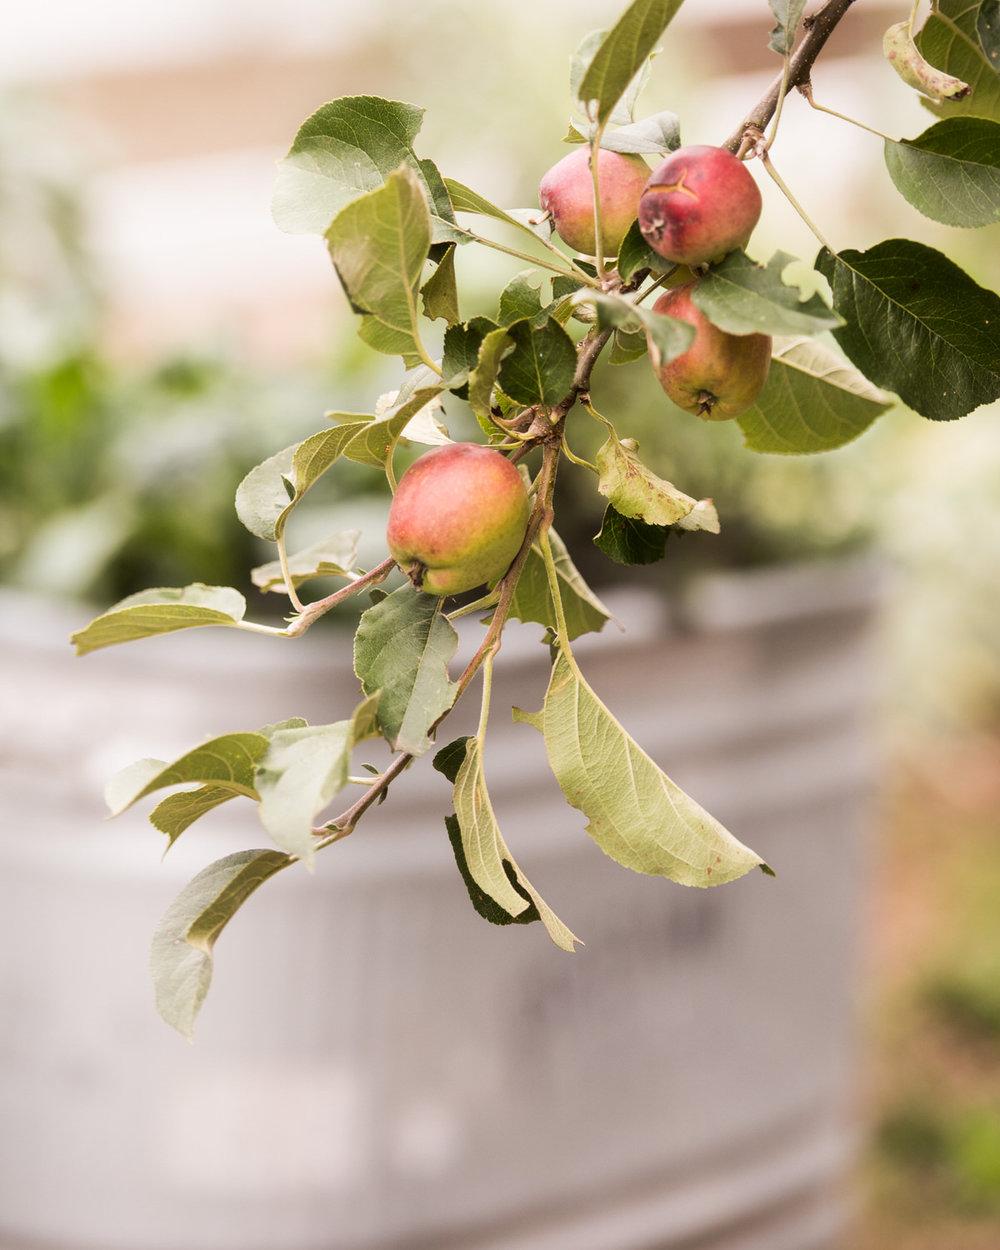 Bainbridge Island Apples Farm Wedding Cider.jpg